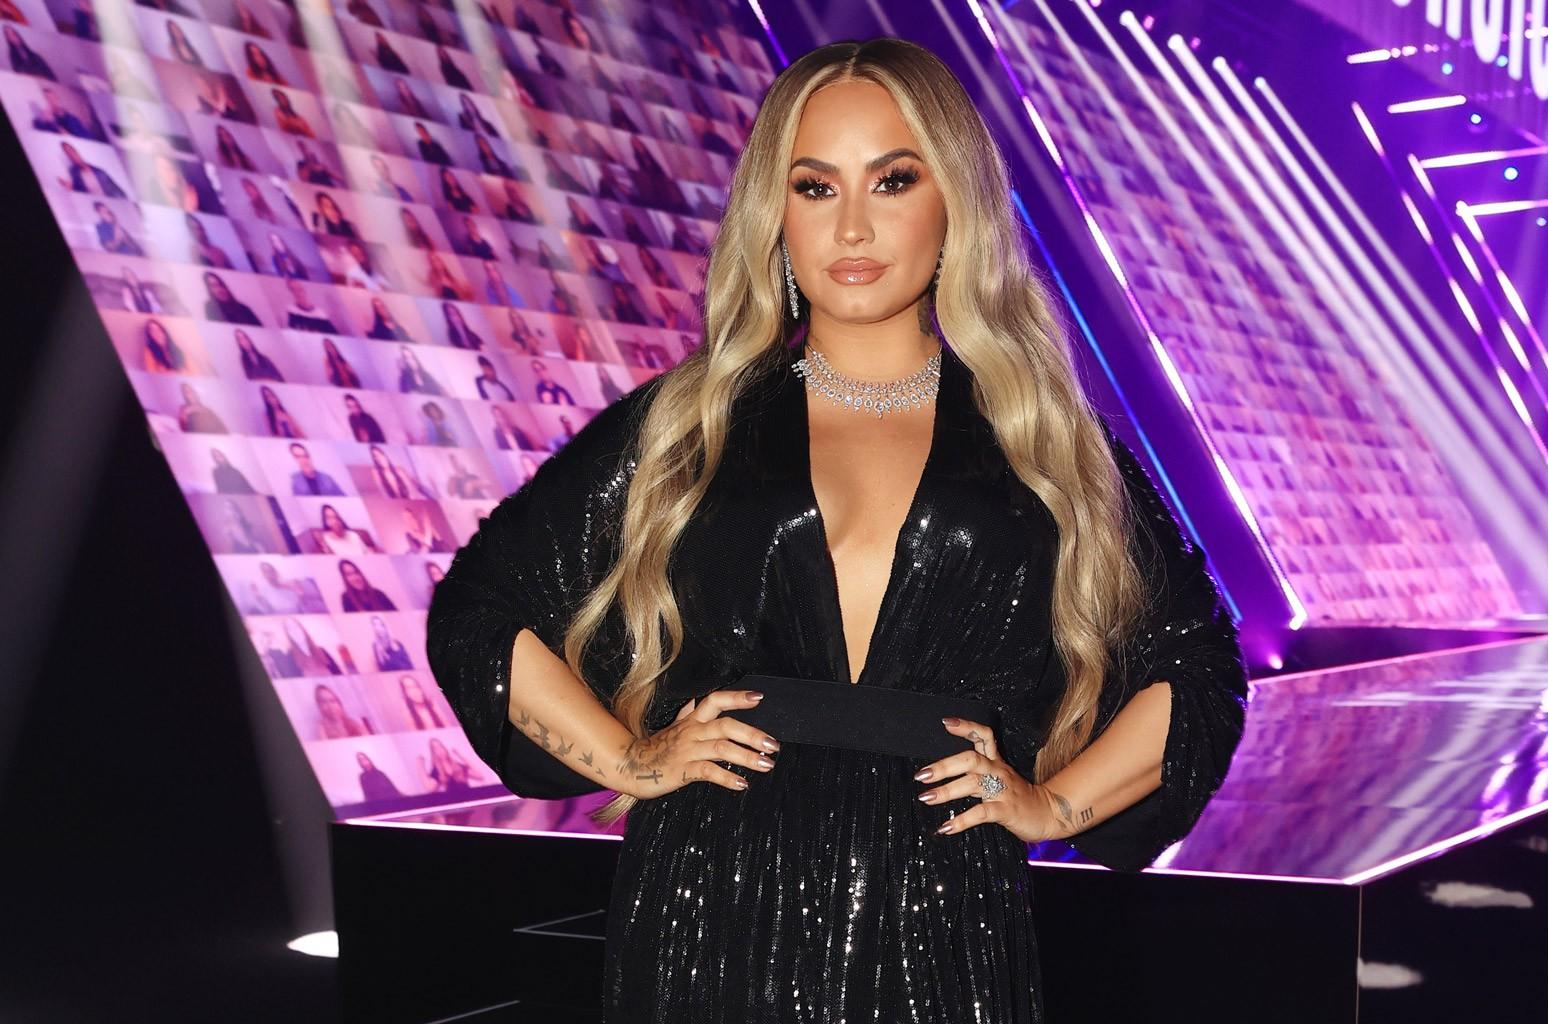 Christina Aguilera, JoJo, Elton John & More Support Demi Lovato Following Documentary Trailer